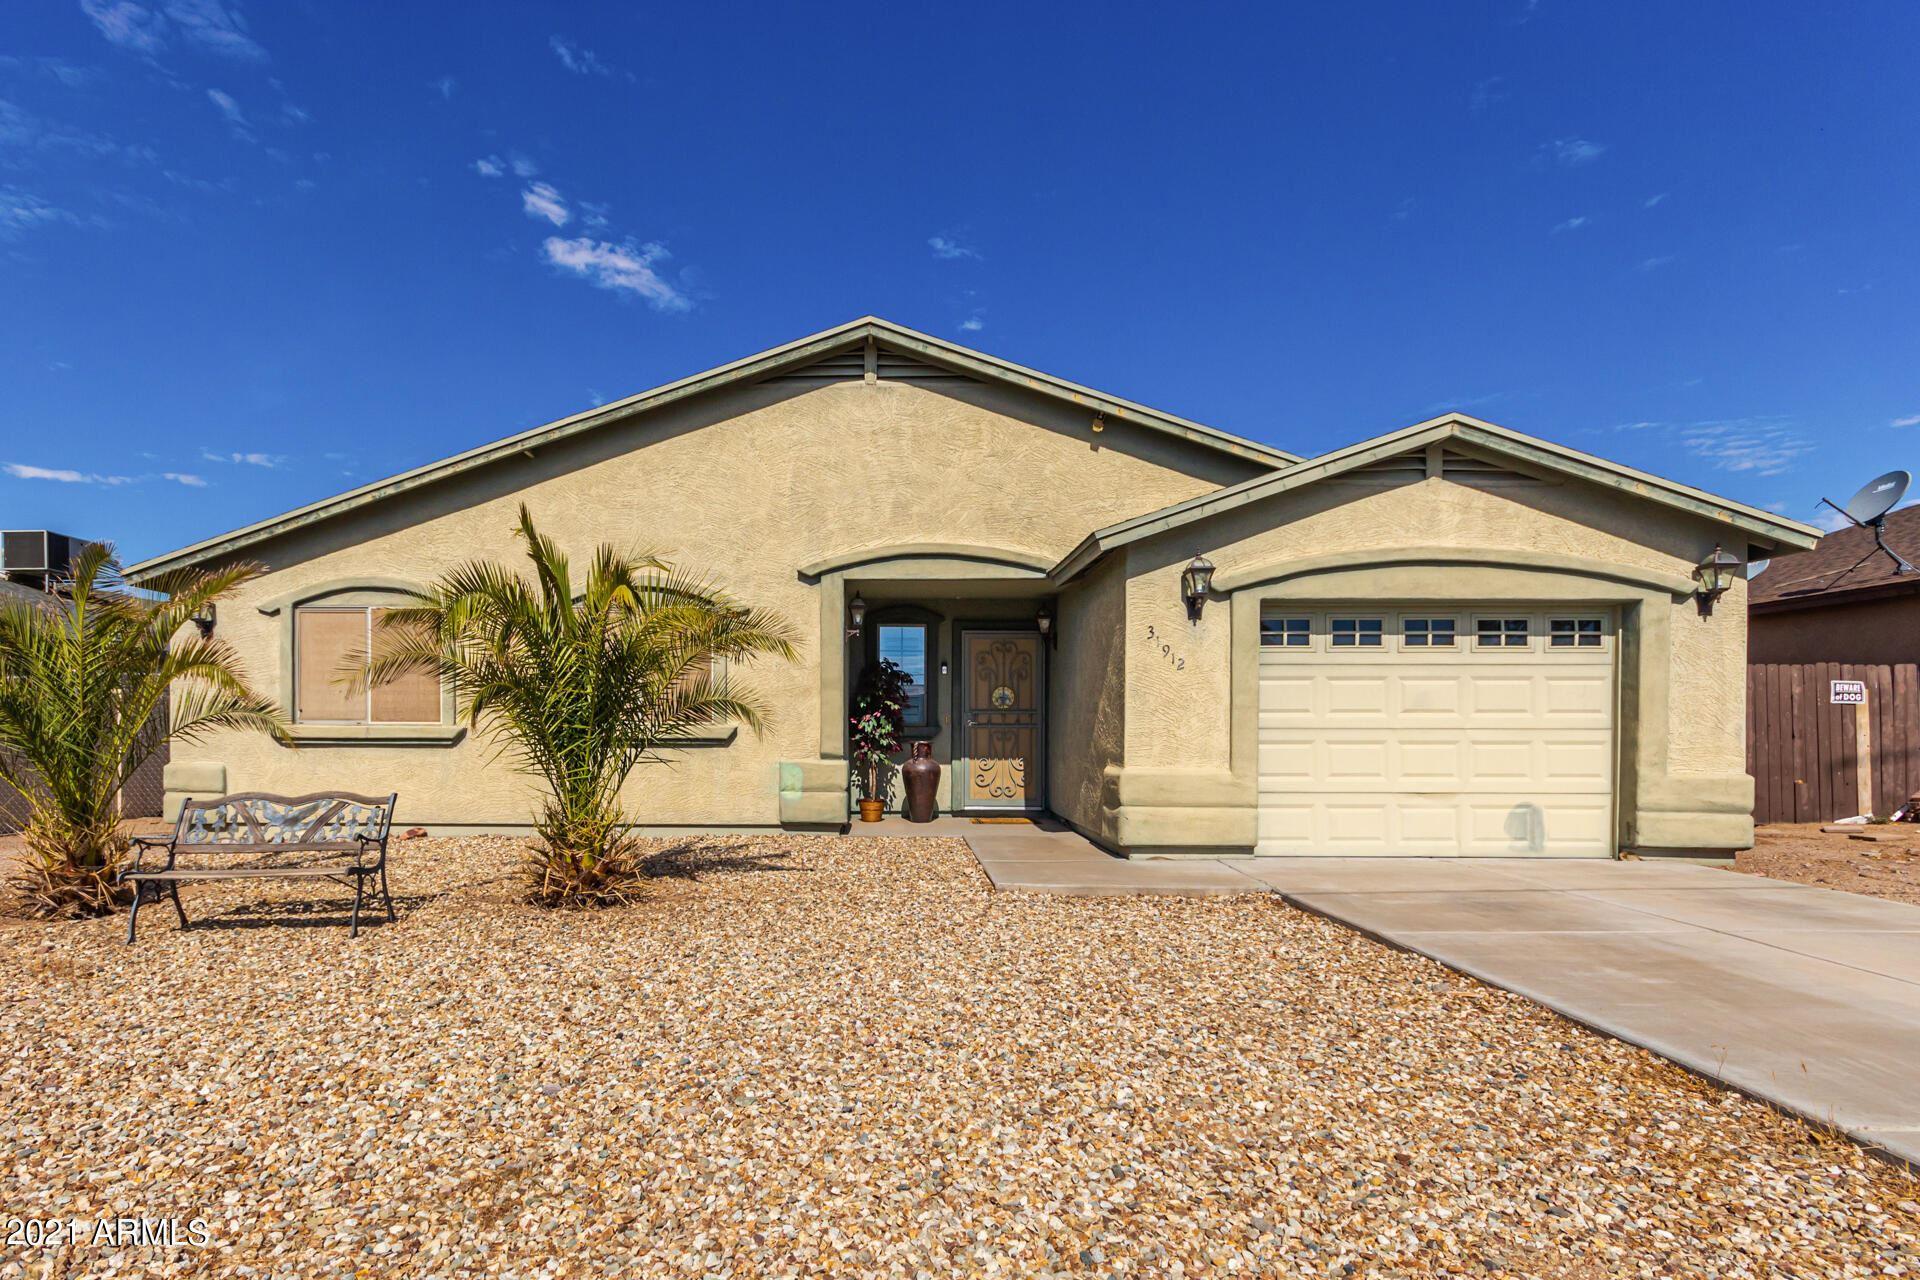 Photo of 31912 N BUSH Street, Wittmann, AZ 85361 (MLS # 6261070)